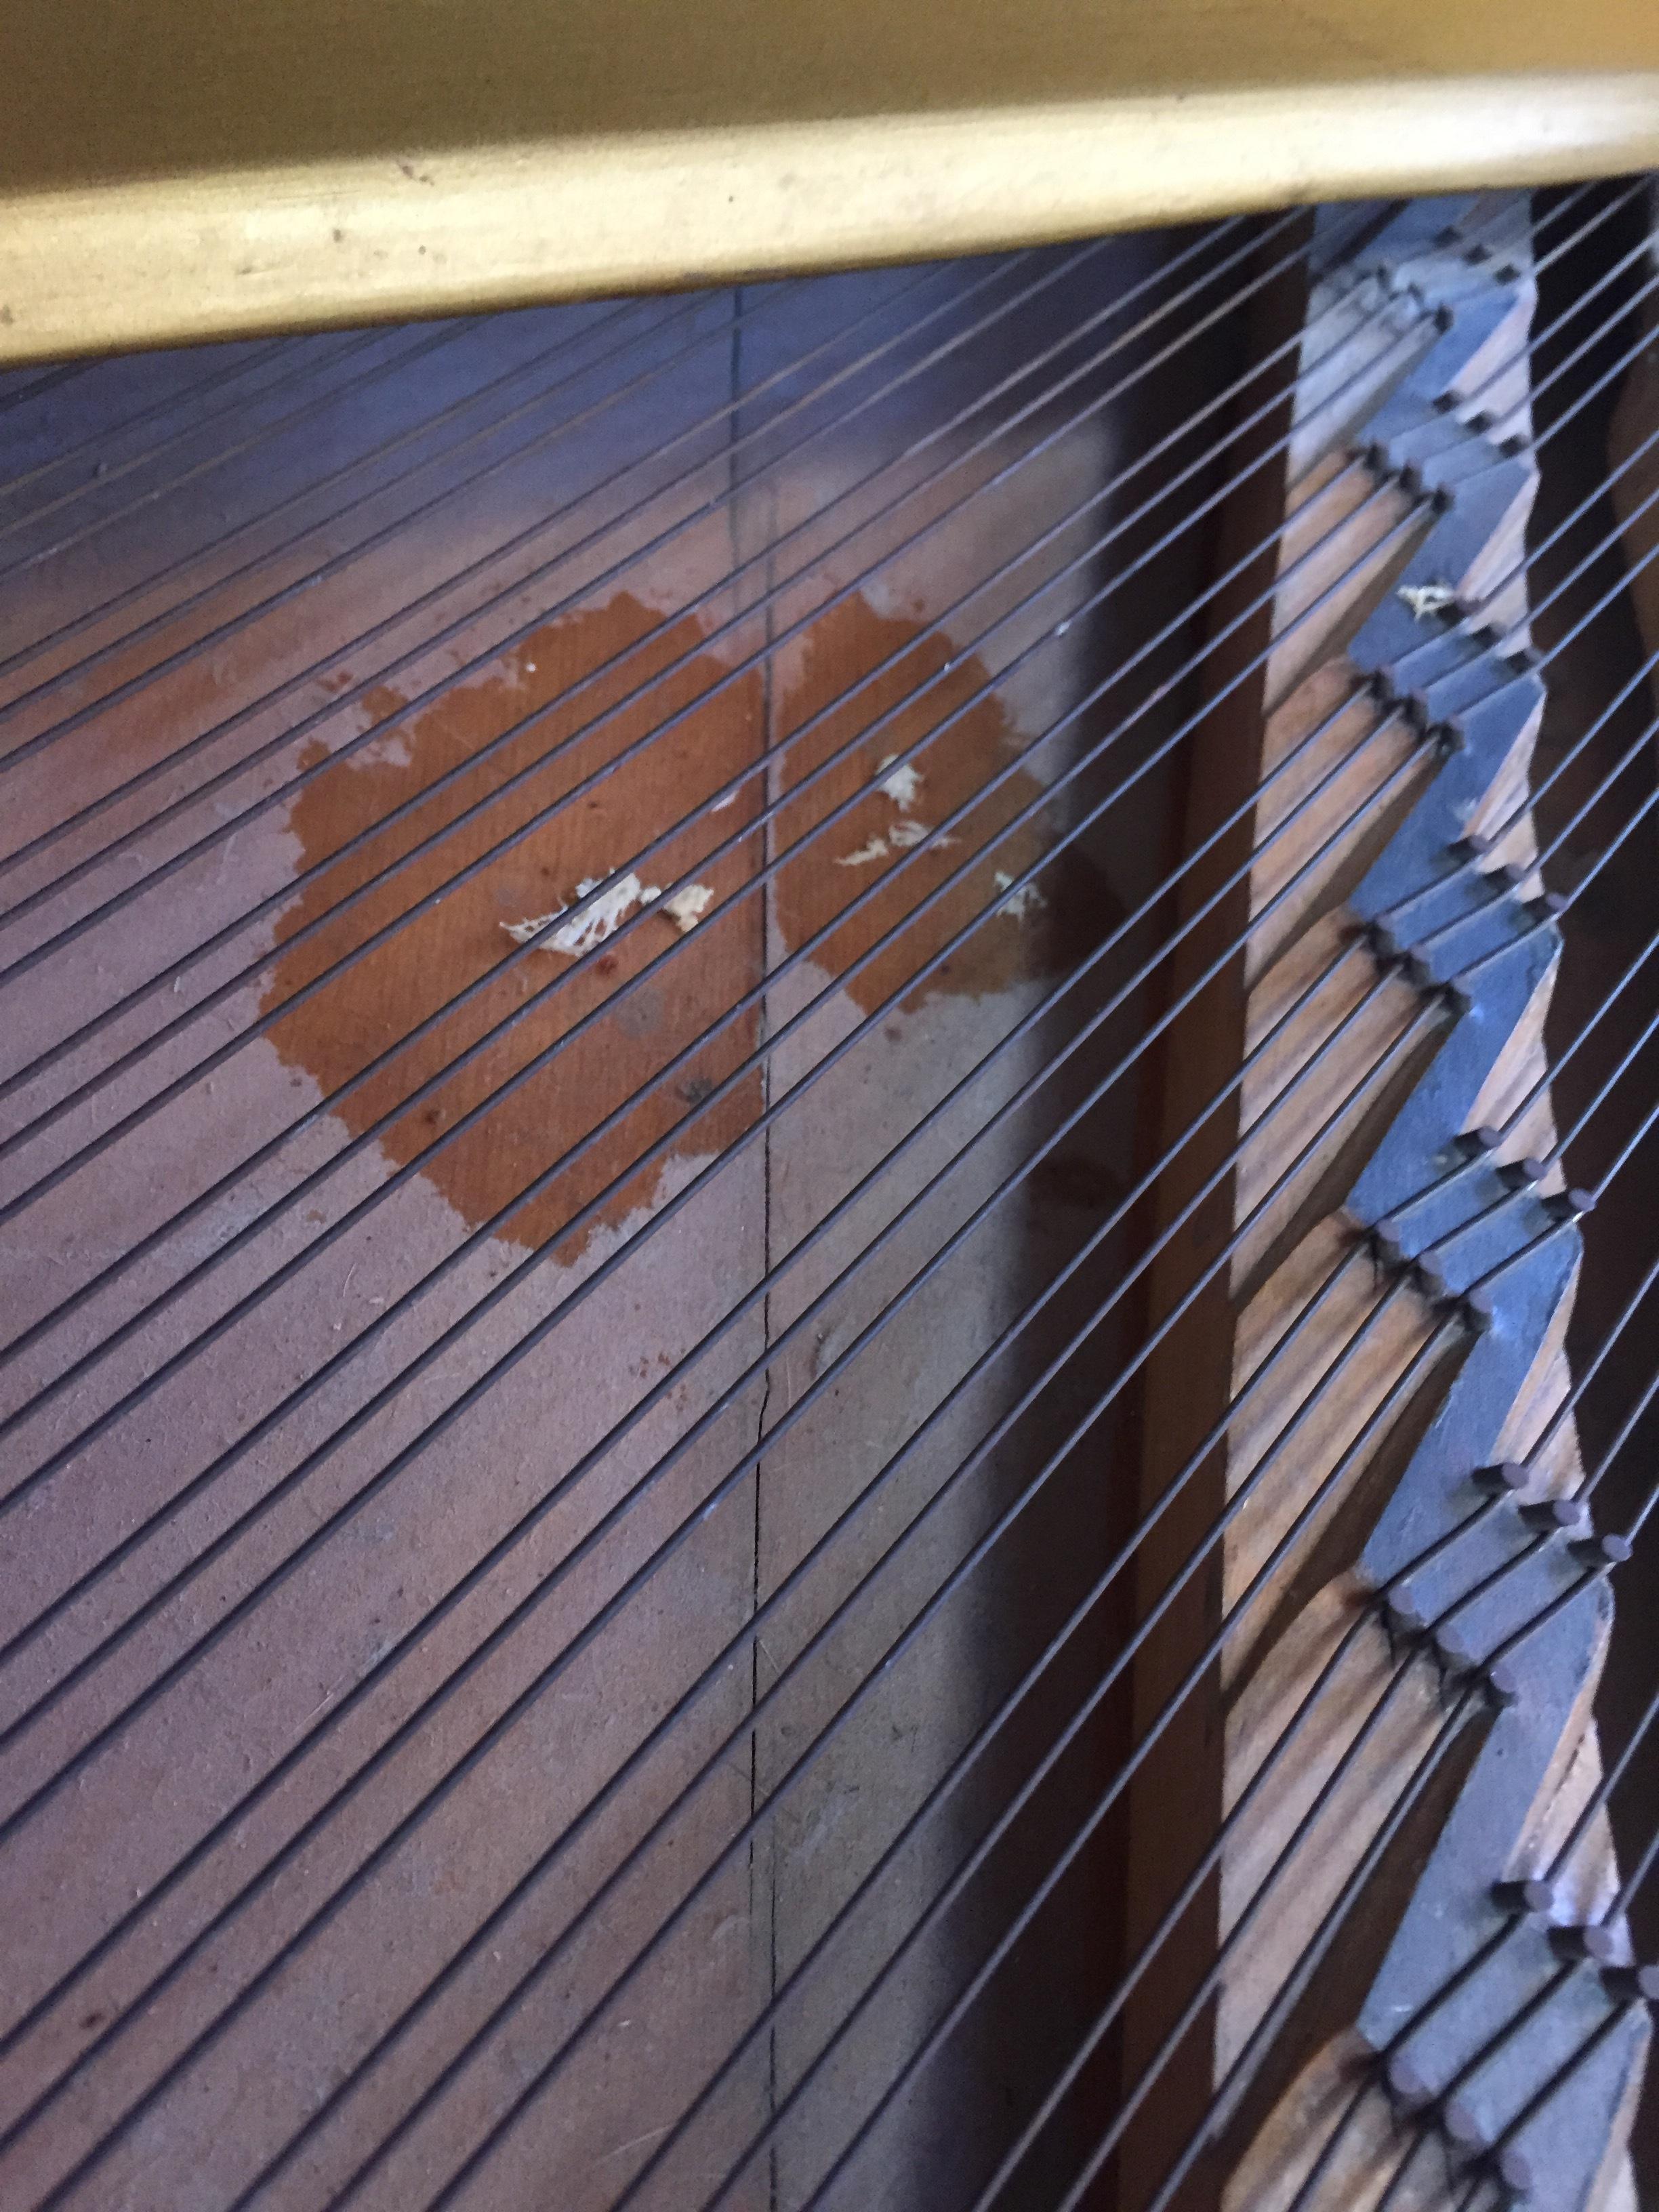 Badly split soundboard, corroded strings, broken bridges and ingrained dirt